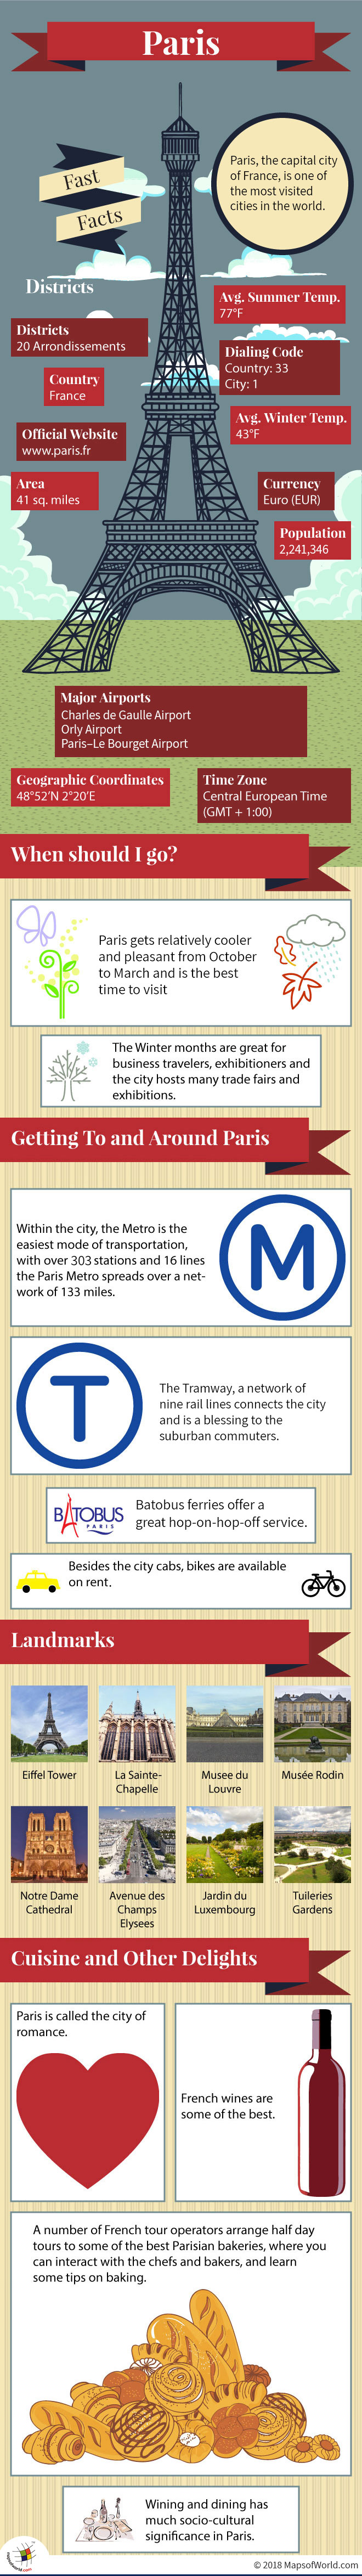 Infographic Depicting Paris Fast Facts